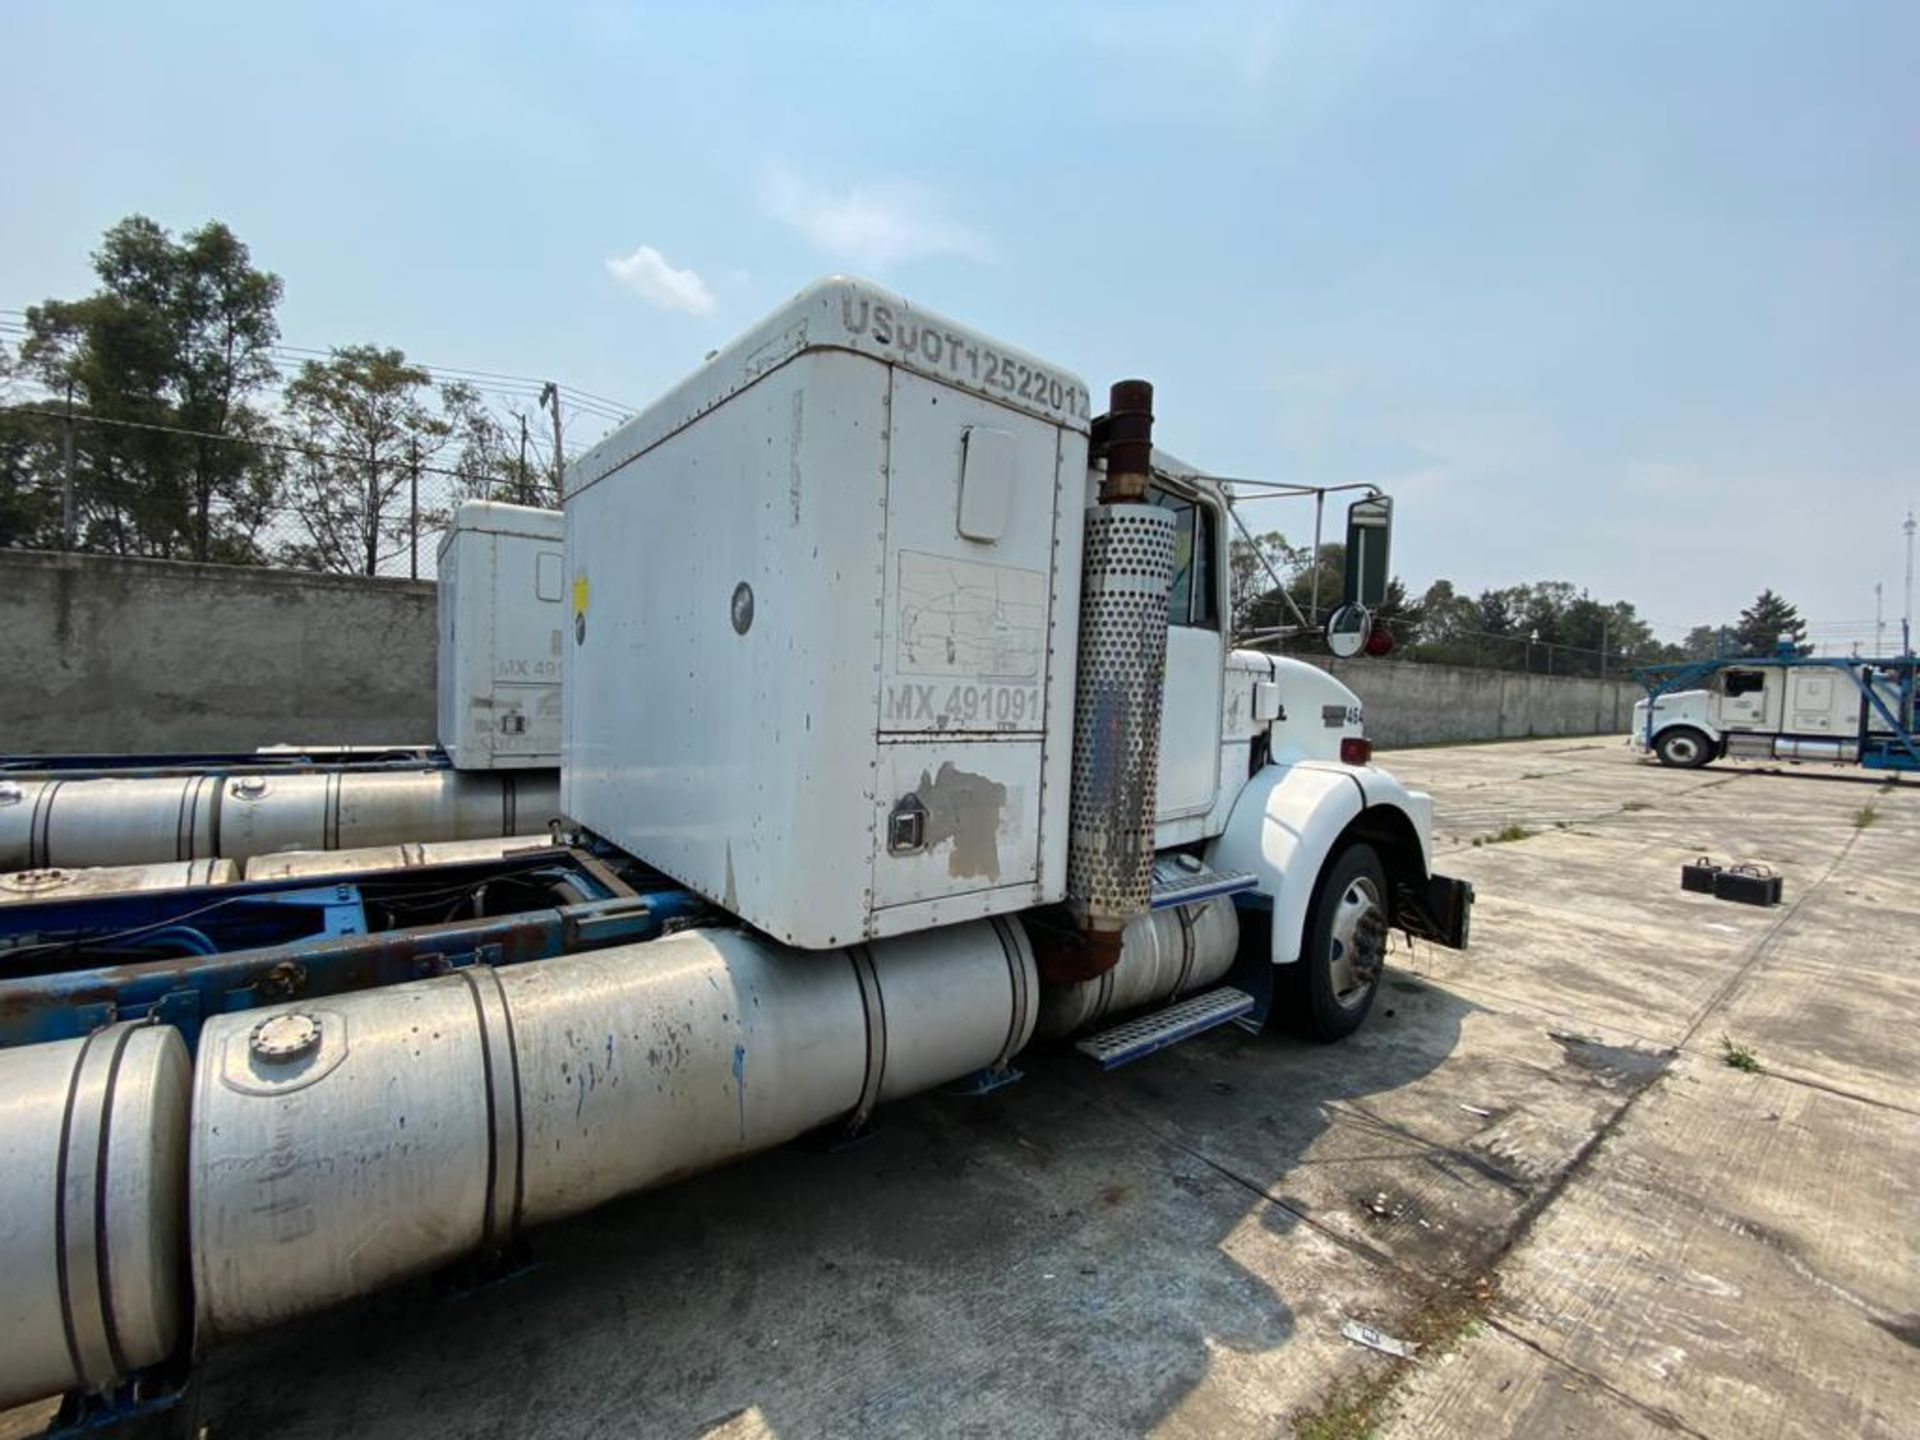 1999 Kenworth Sleeper truck tractor, standard transmission of 18 speeds - Image 25 of 70